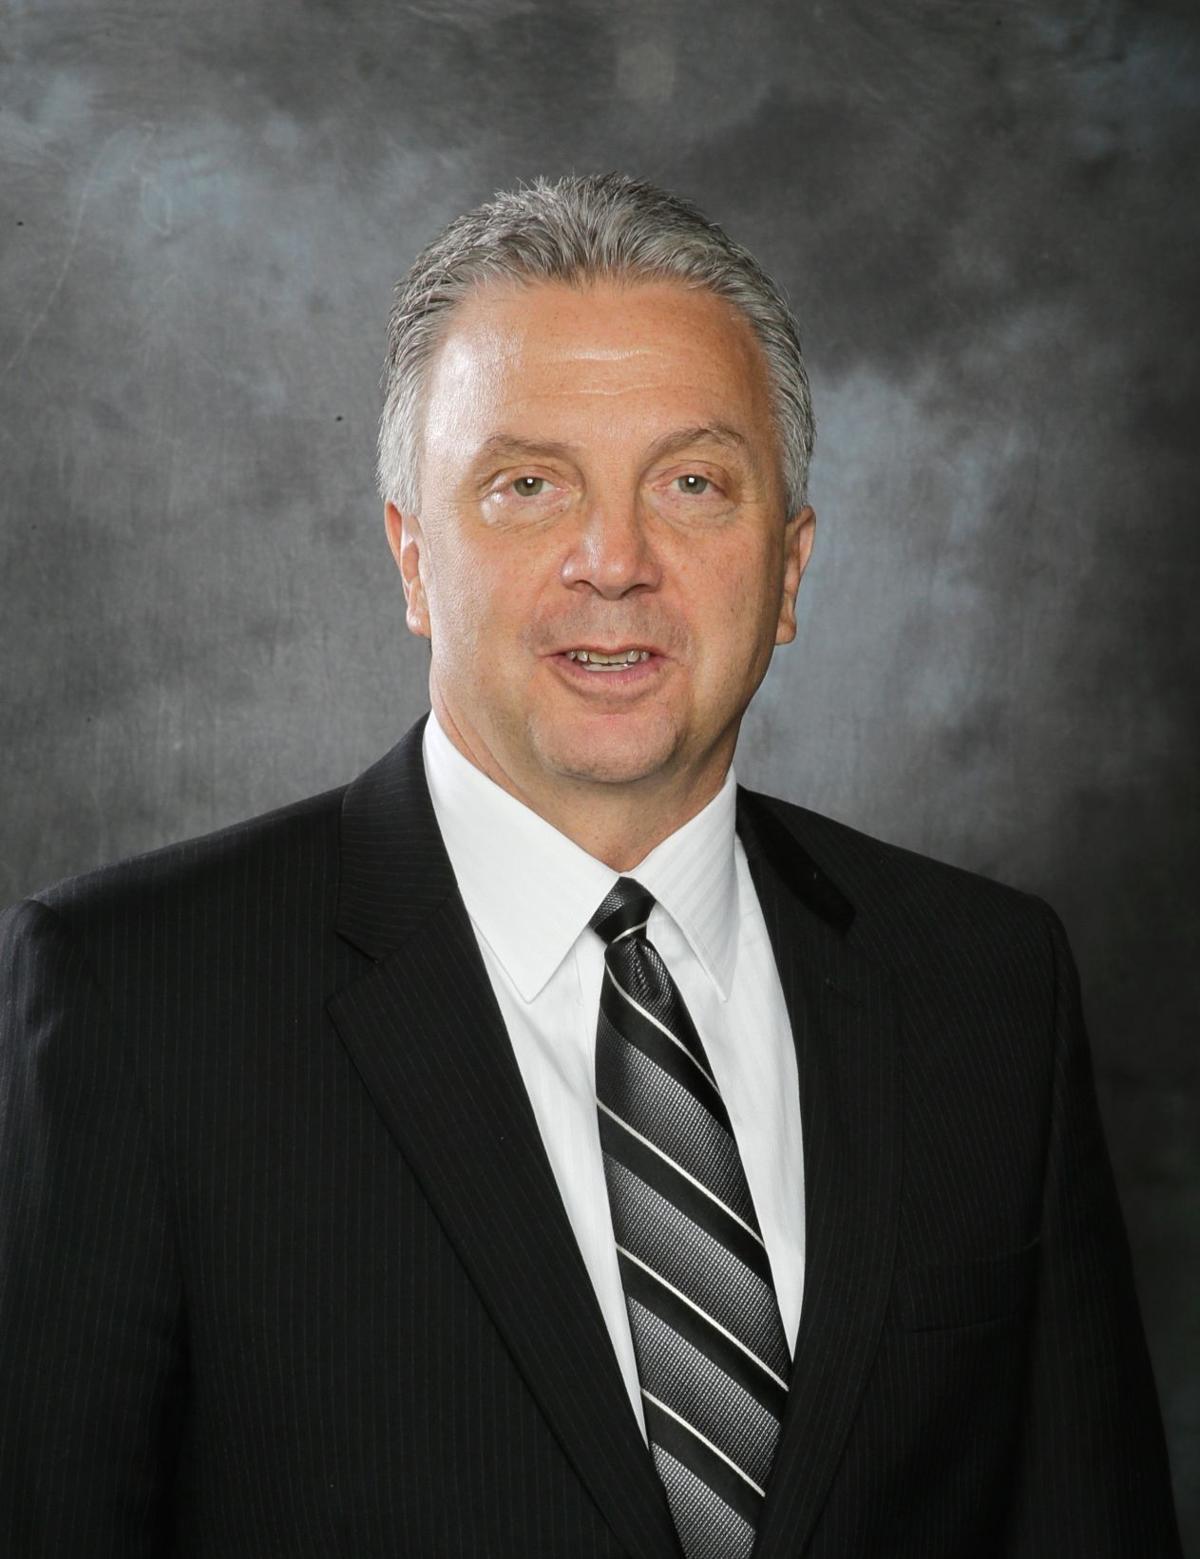 Montana Supreme Court justice Dirk Sandefur